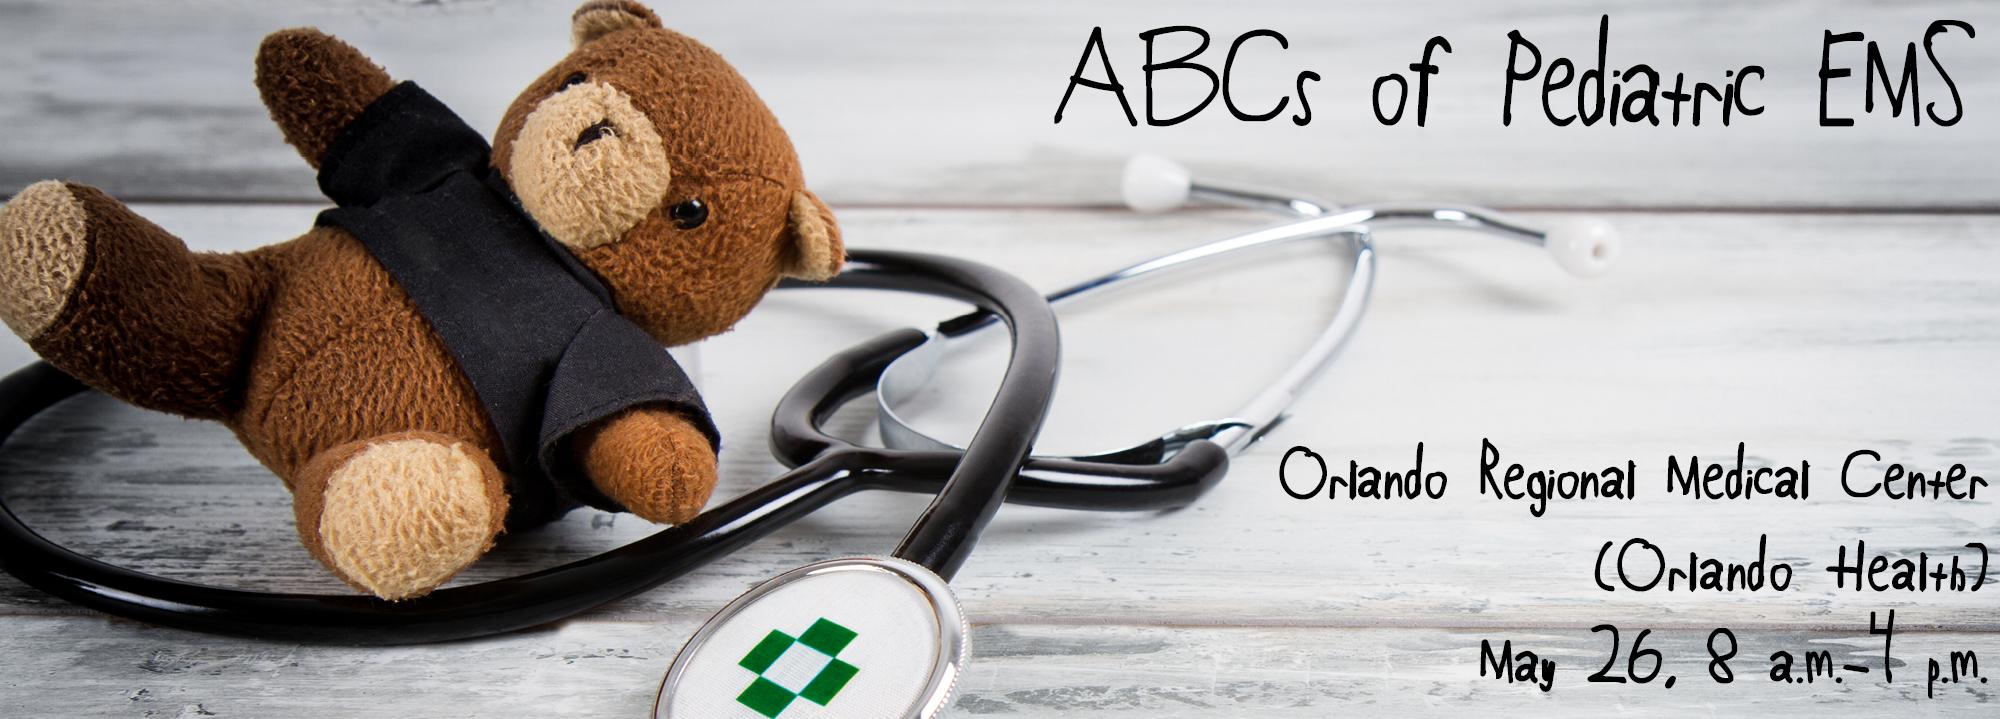 ABCs of Pediatric EMS 2016